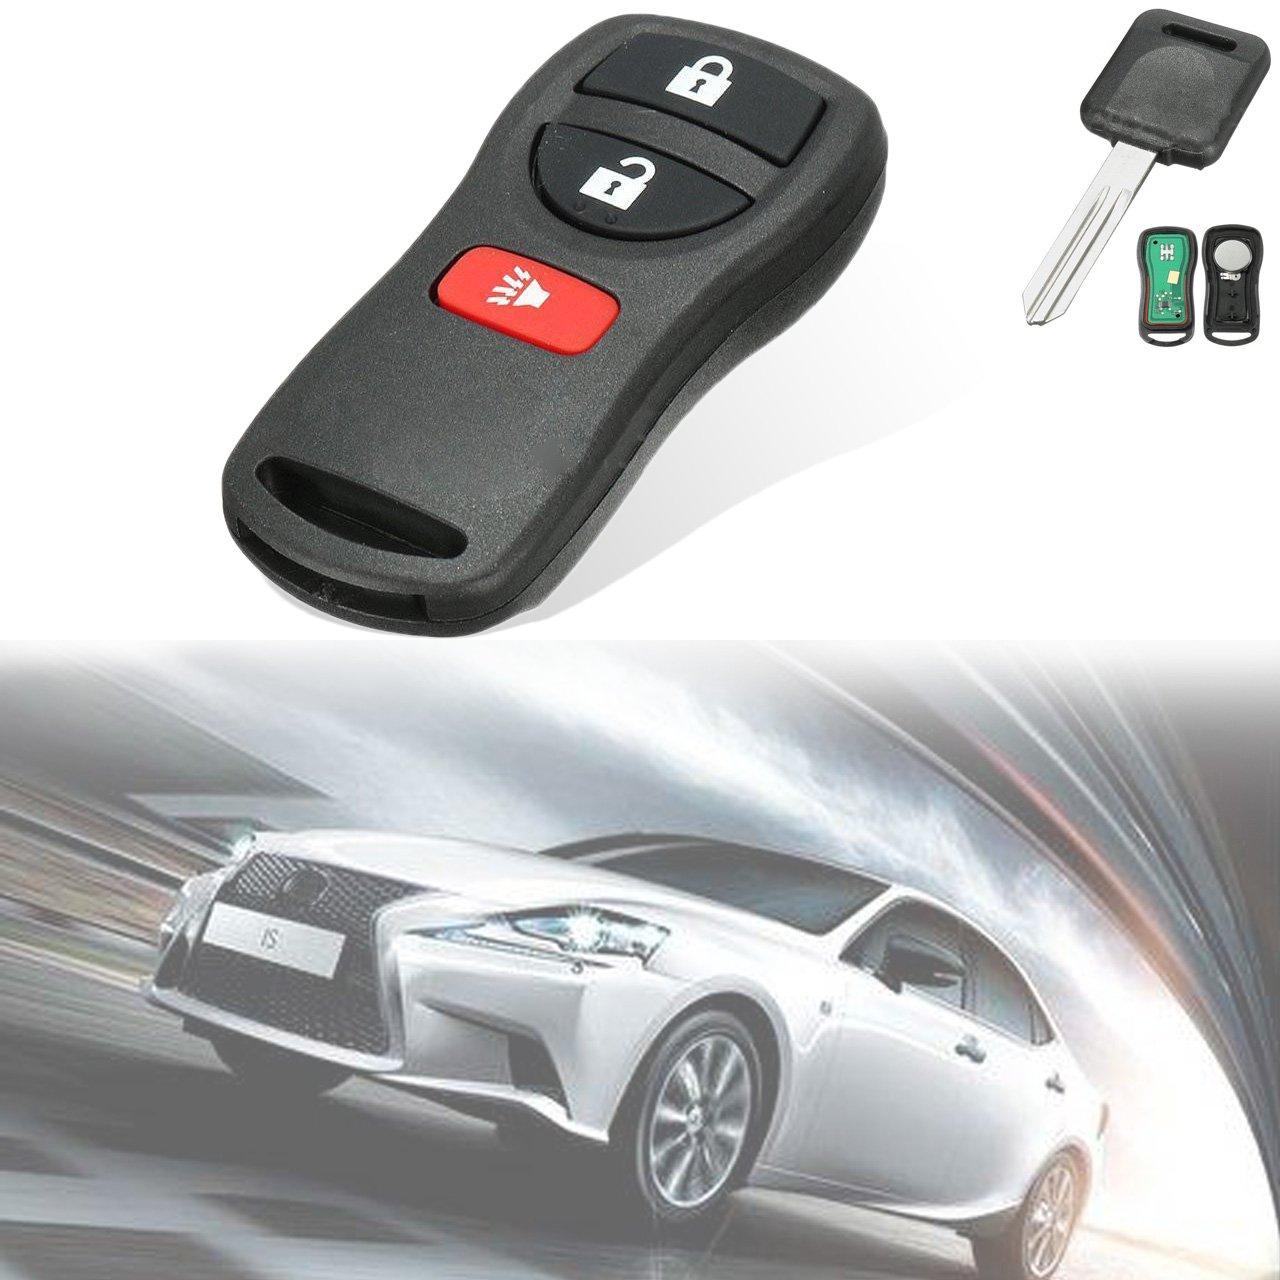 KaTur 3 Button Key Fob Keyless Entry Remote Fits Nissan Frontier Armada Murano Pathfinder Quest Sentra Titan Versa Xterra/Infiniti QX4 FX35 FX45 (BRASTU15, CWTWB1U415, CWTWB1U733, CWTWB1U821)